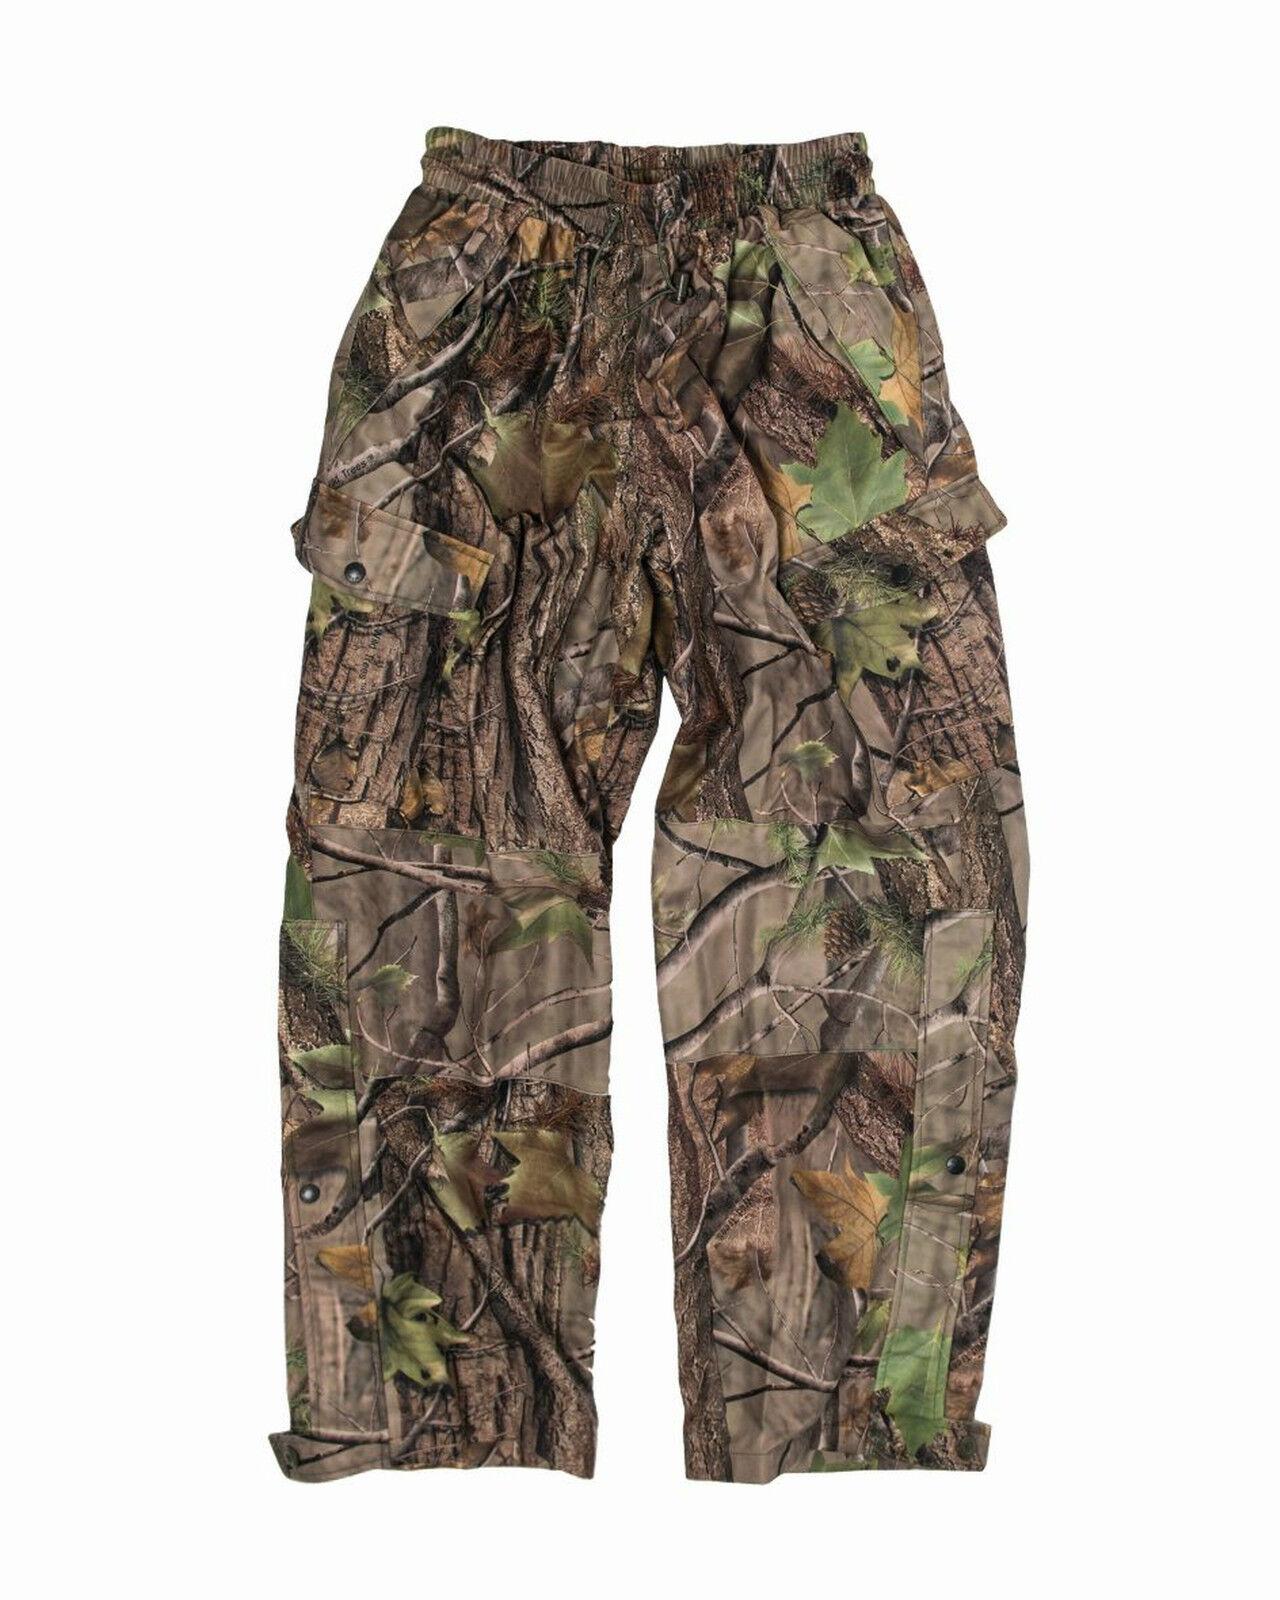 Mil-tec Hunting trousers Wild trees HD pantalones caza pantalones pirschhose Paintball